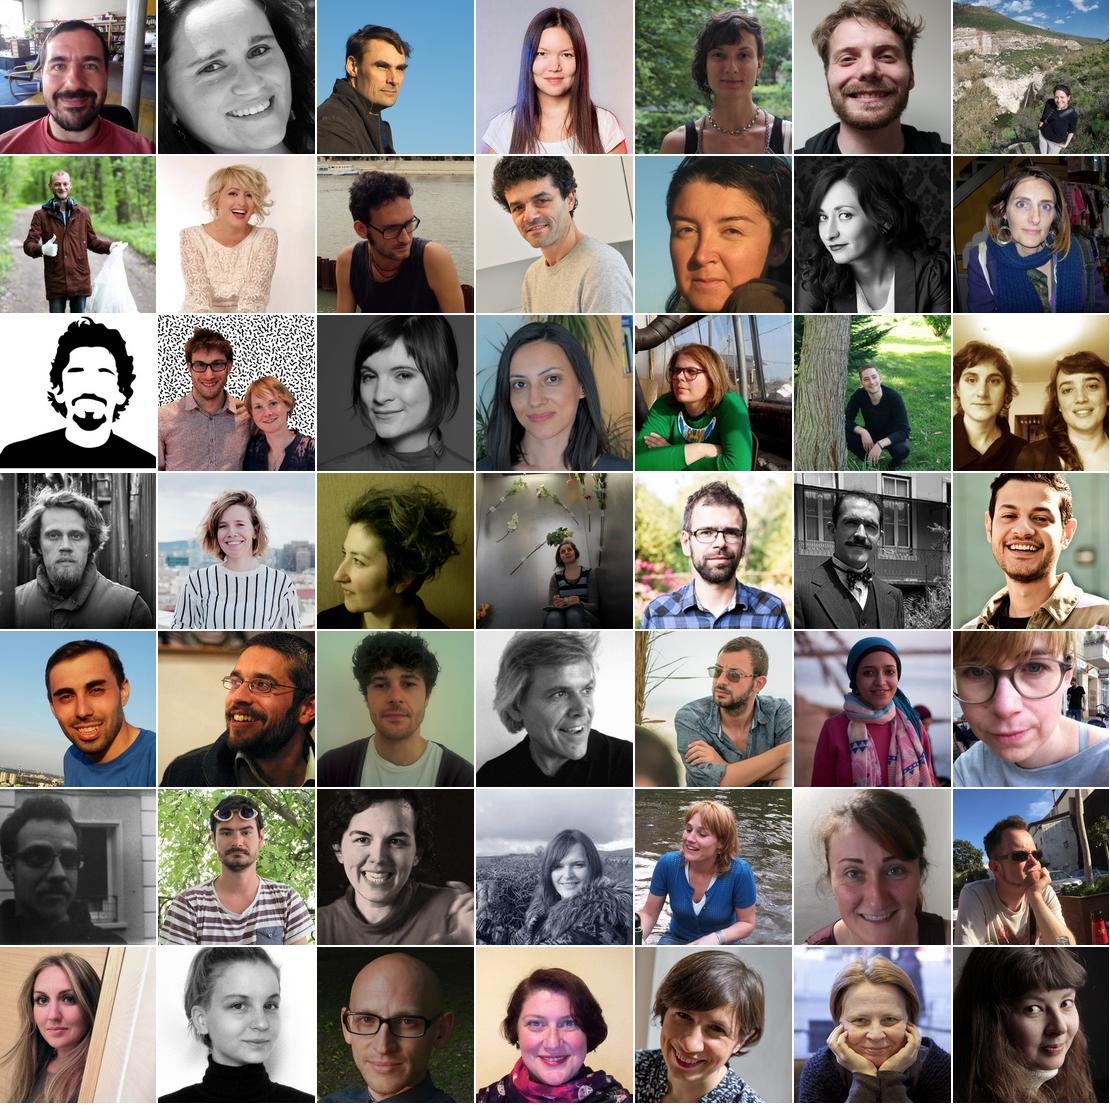 The 2015 Idea Makers